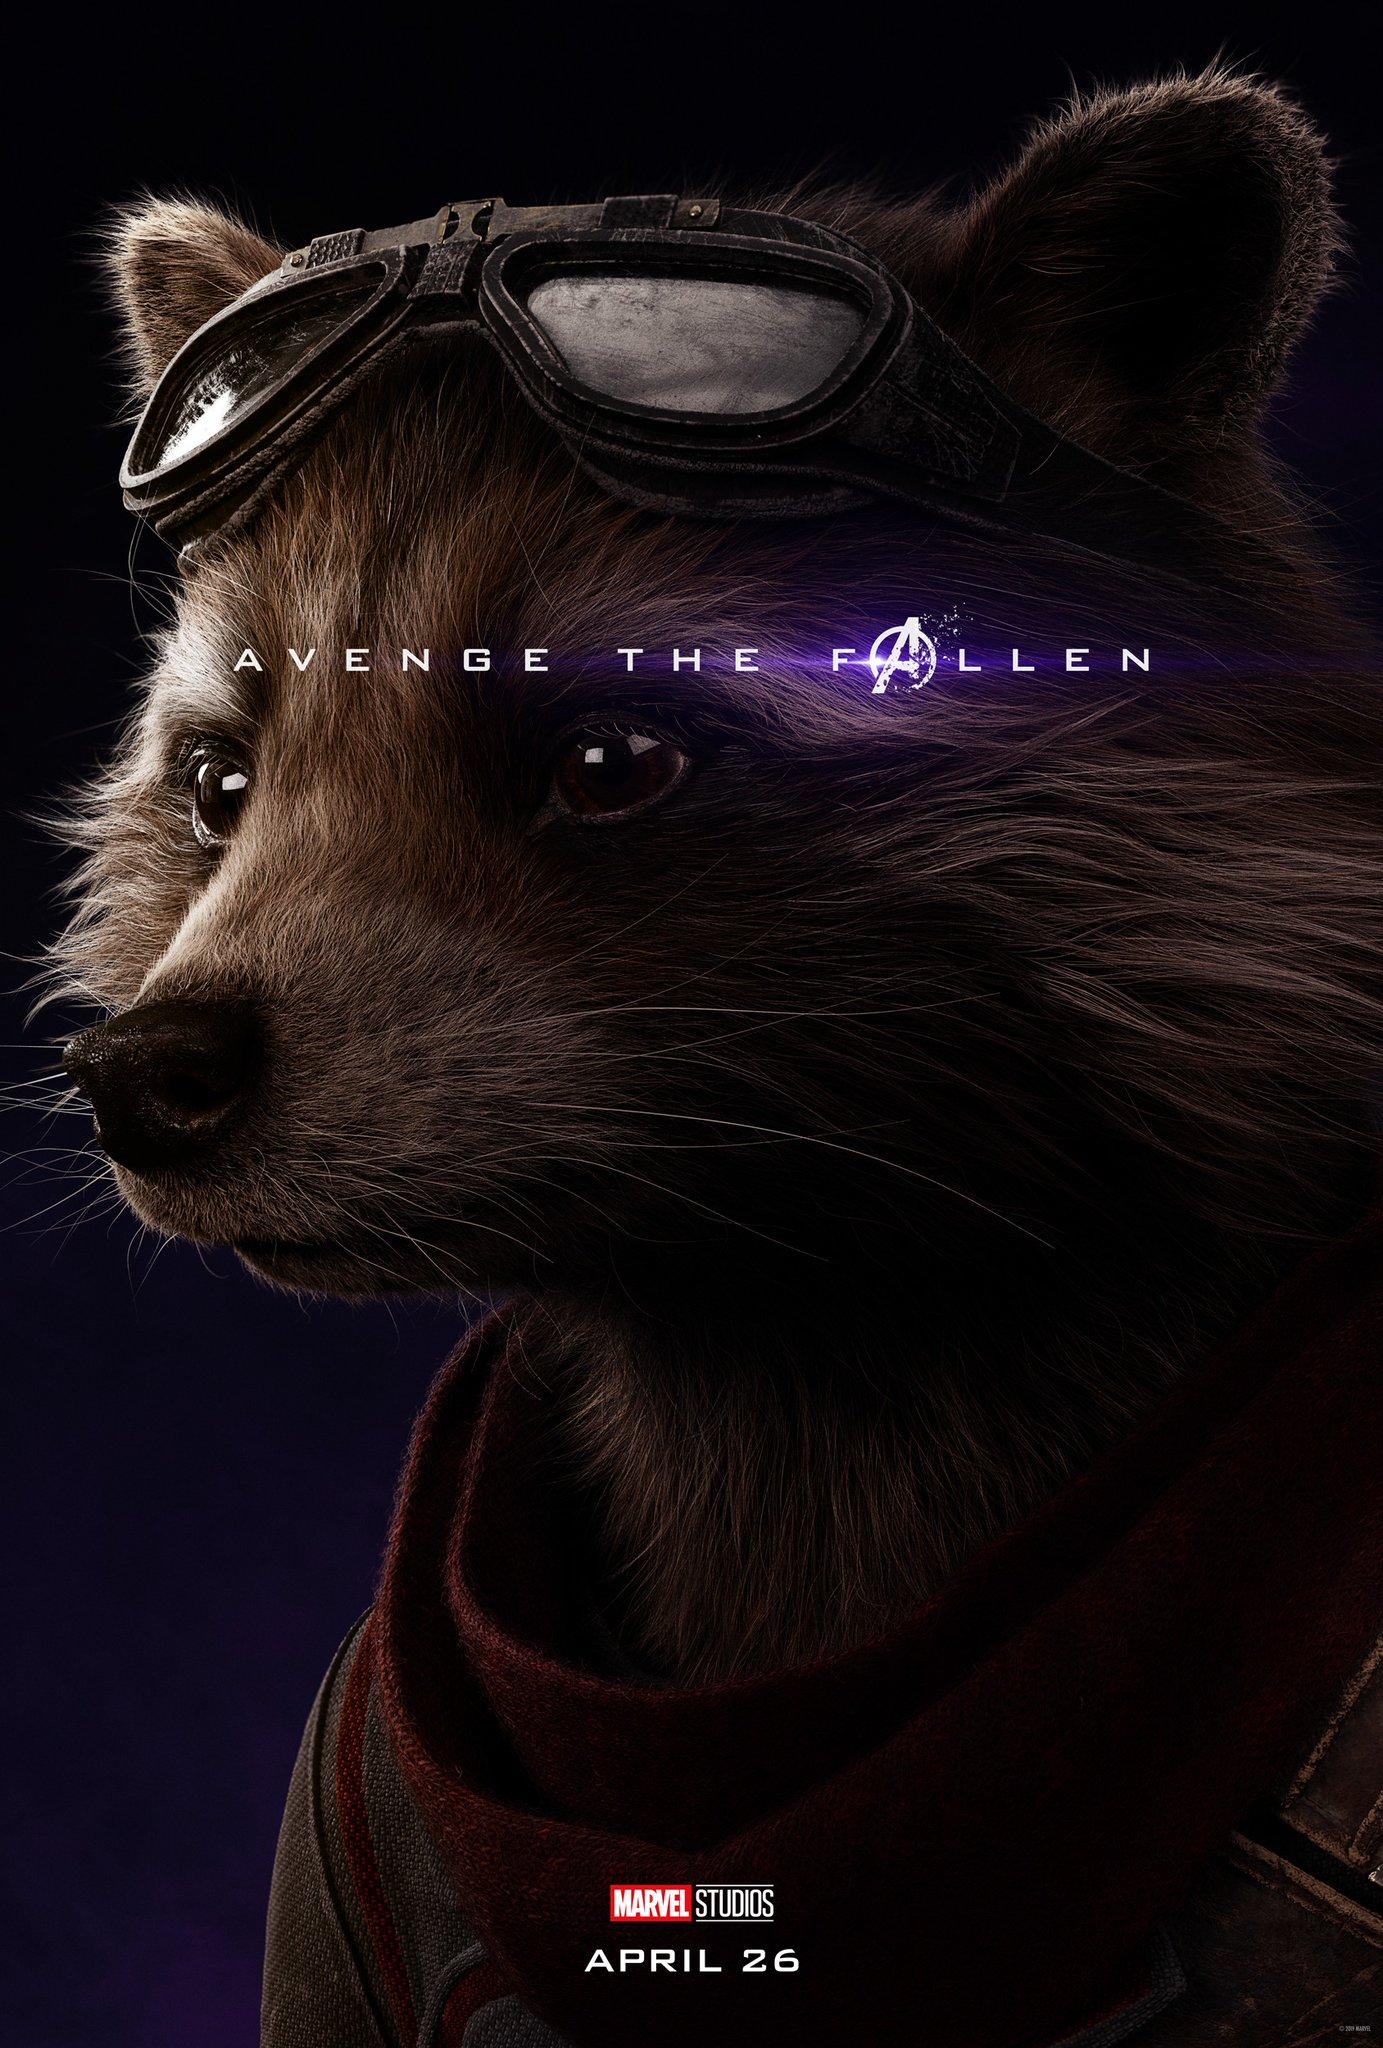 Avengers: Endgame, il character poster di Rocket